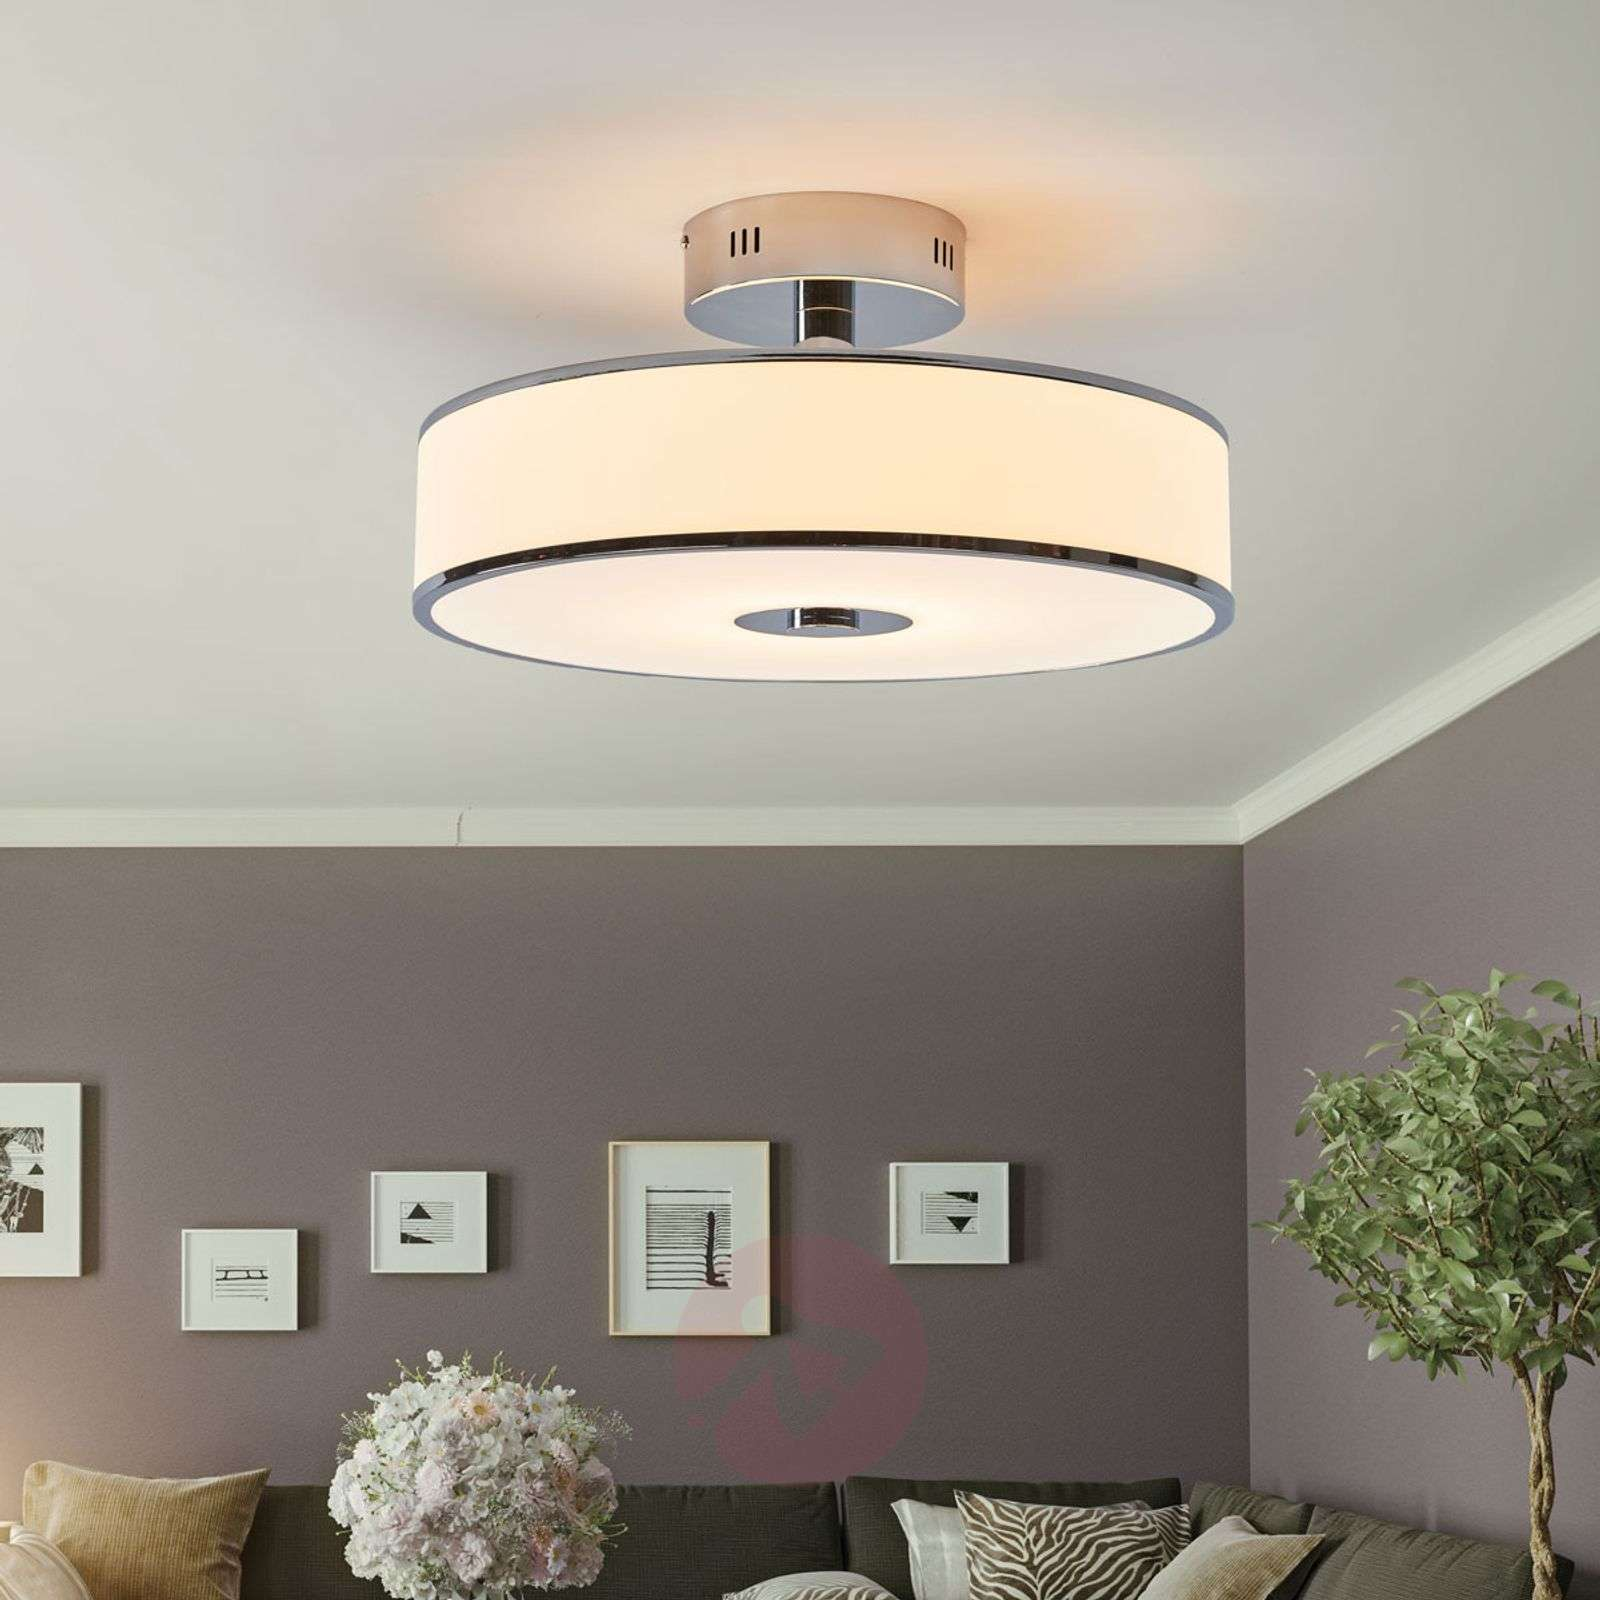 lounge lighting. Dimmable LED Ceiling Lamp Lounge In White/chrome-8507921-02 Lighting E